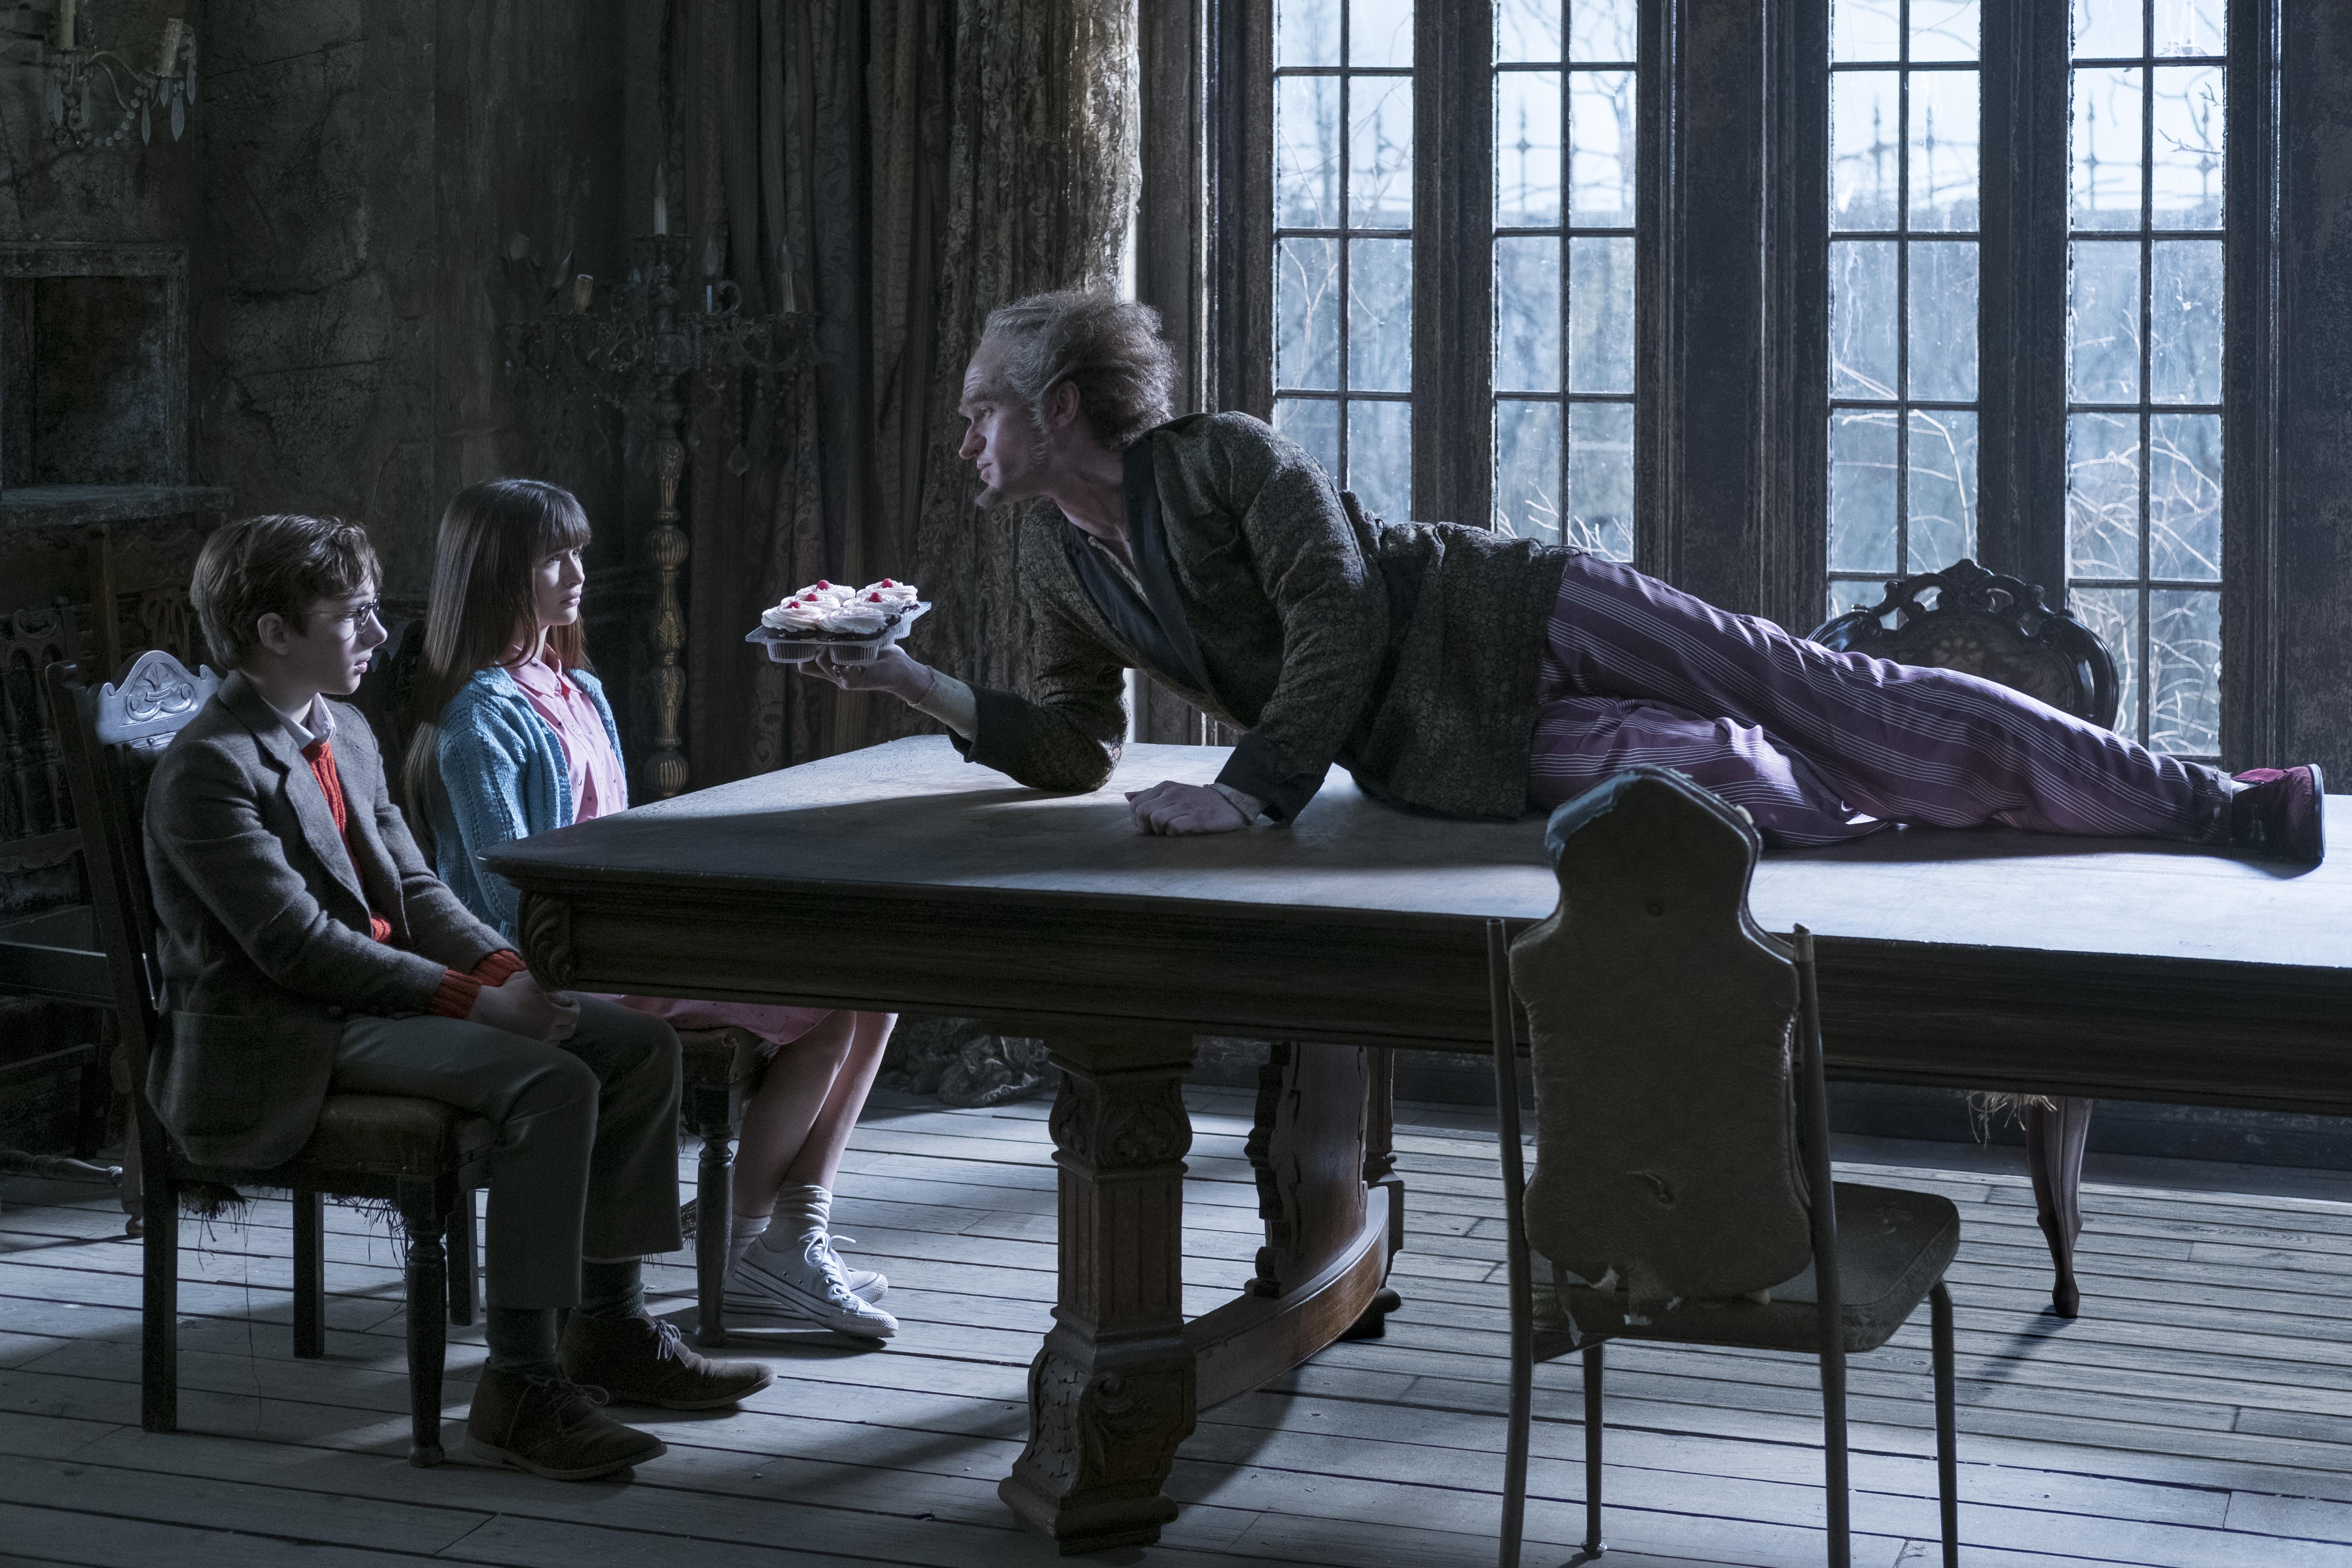 Una serie di sfortunati eventi: l'attore Neil Patrick Harris in una foto della serie